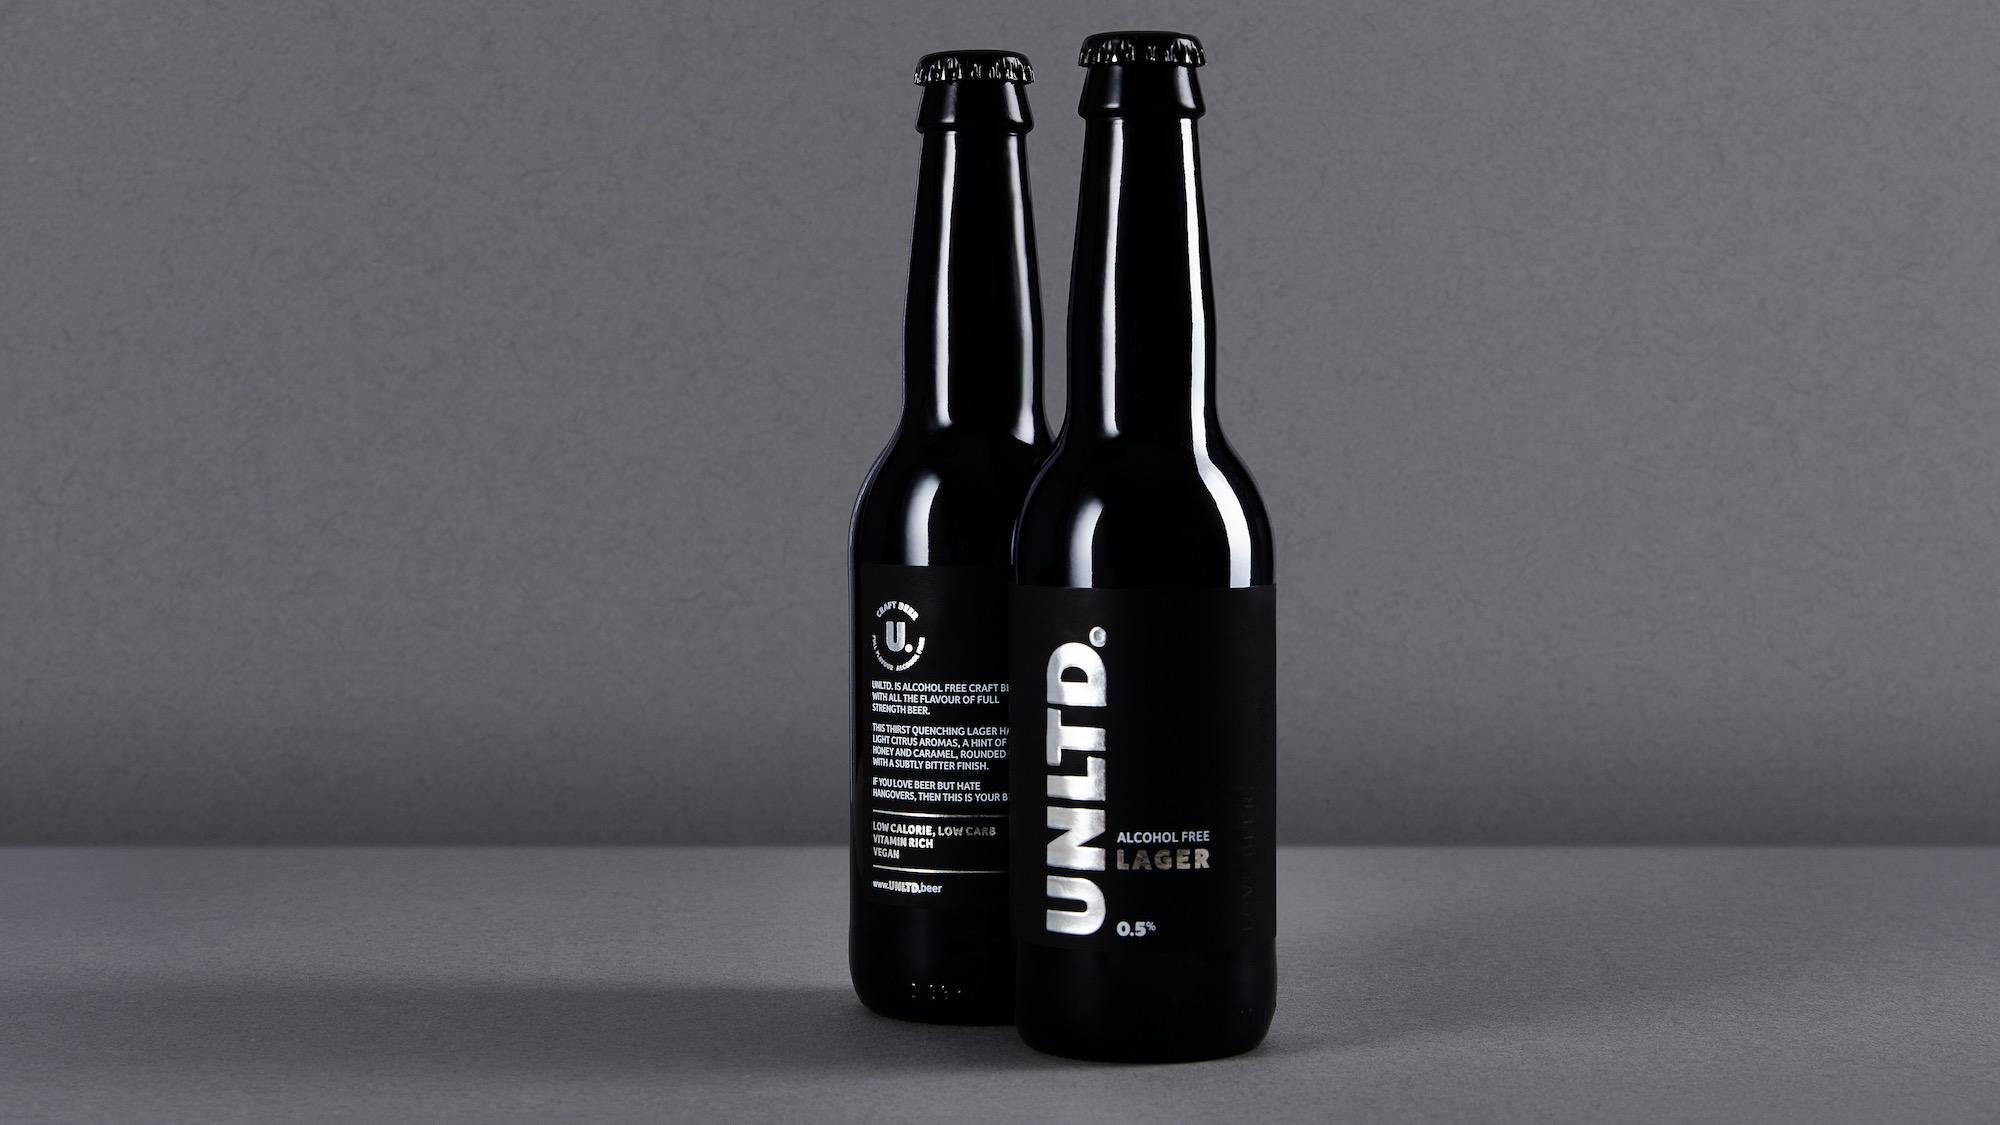 Alcohol Free Lager 0.5% 330ml UNLTD